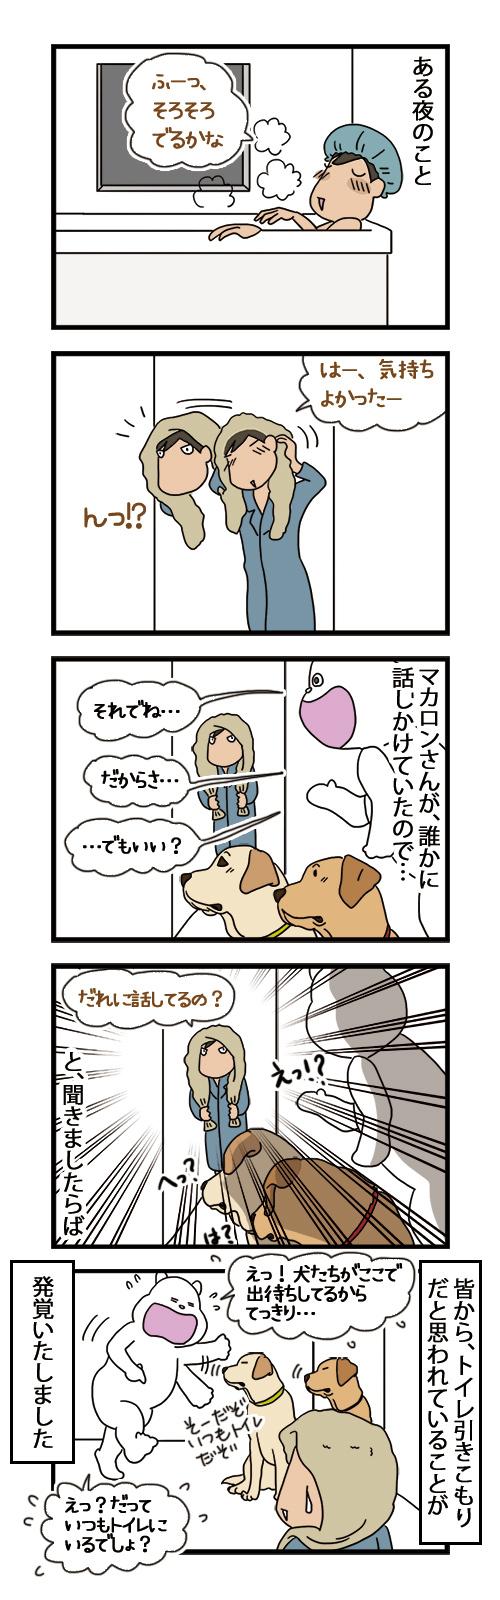 07092021_dogcomic.jpg